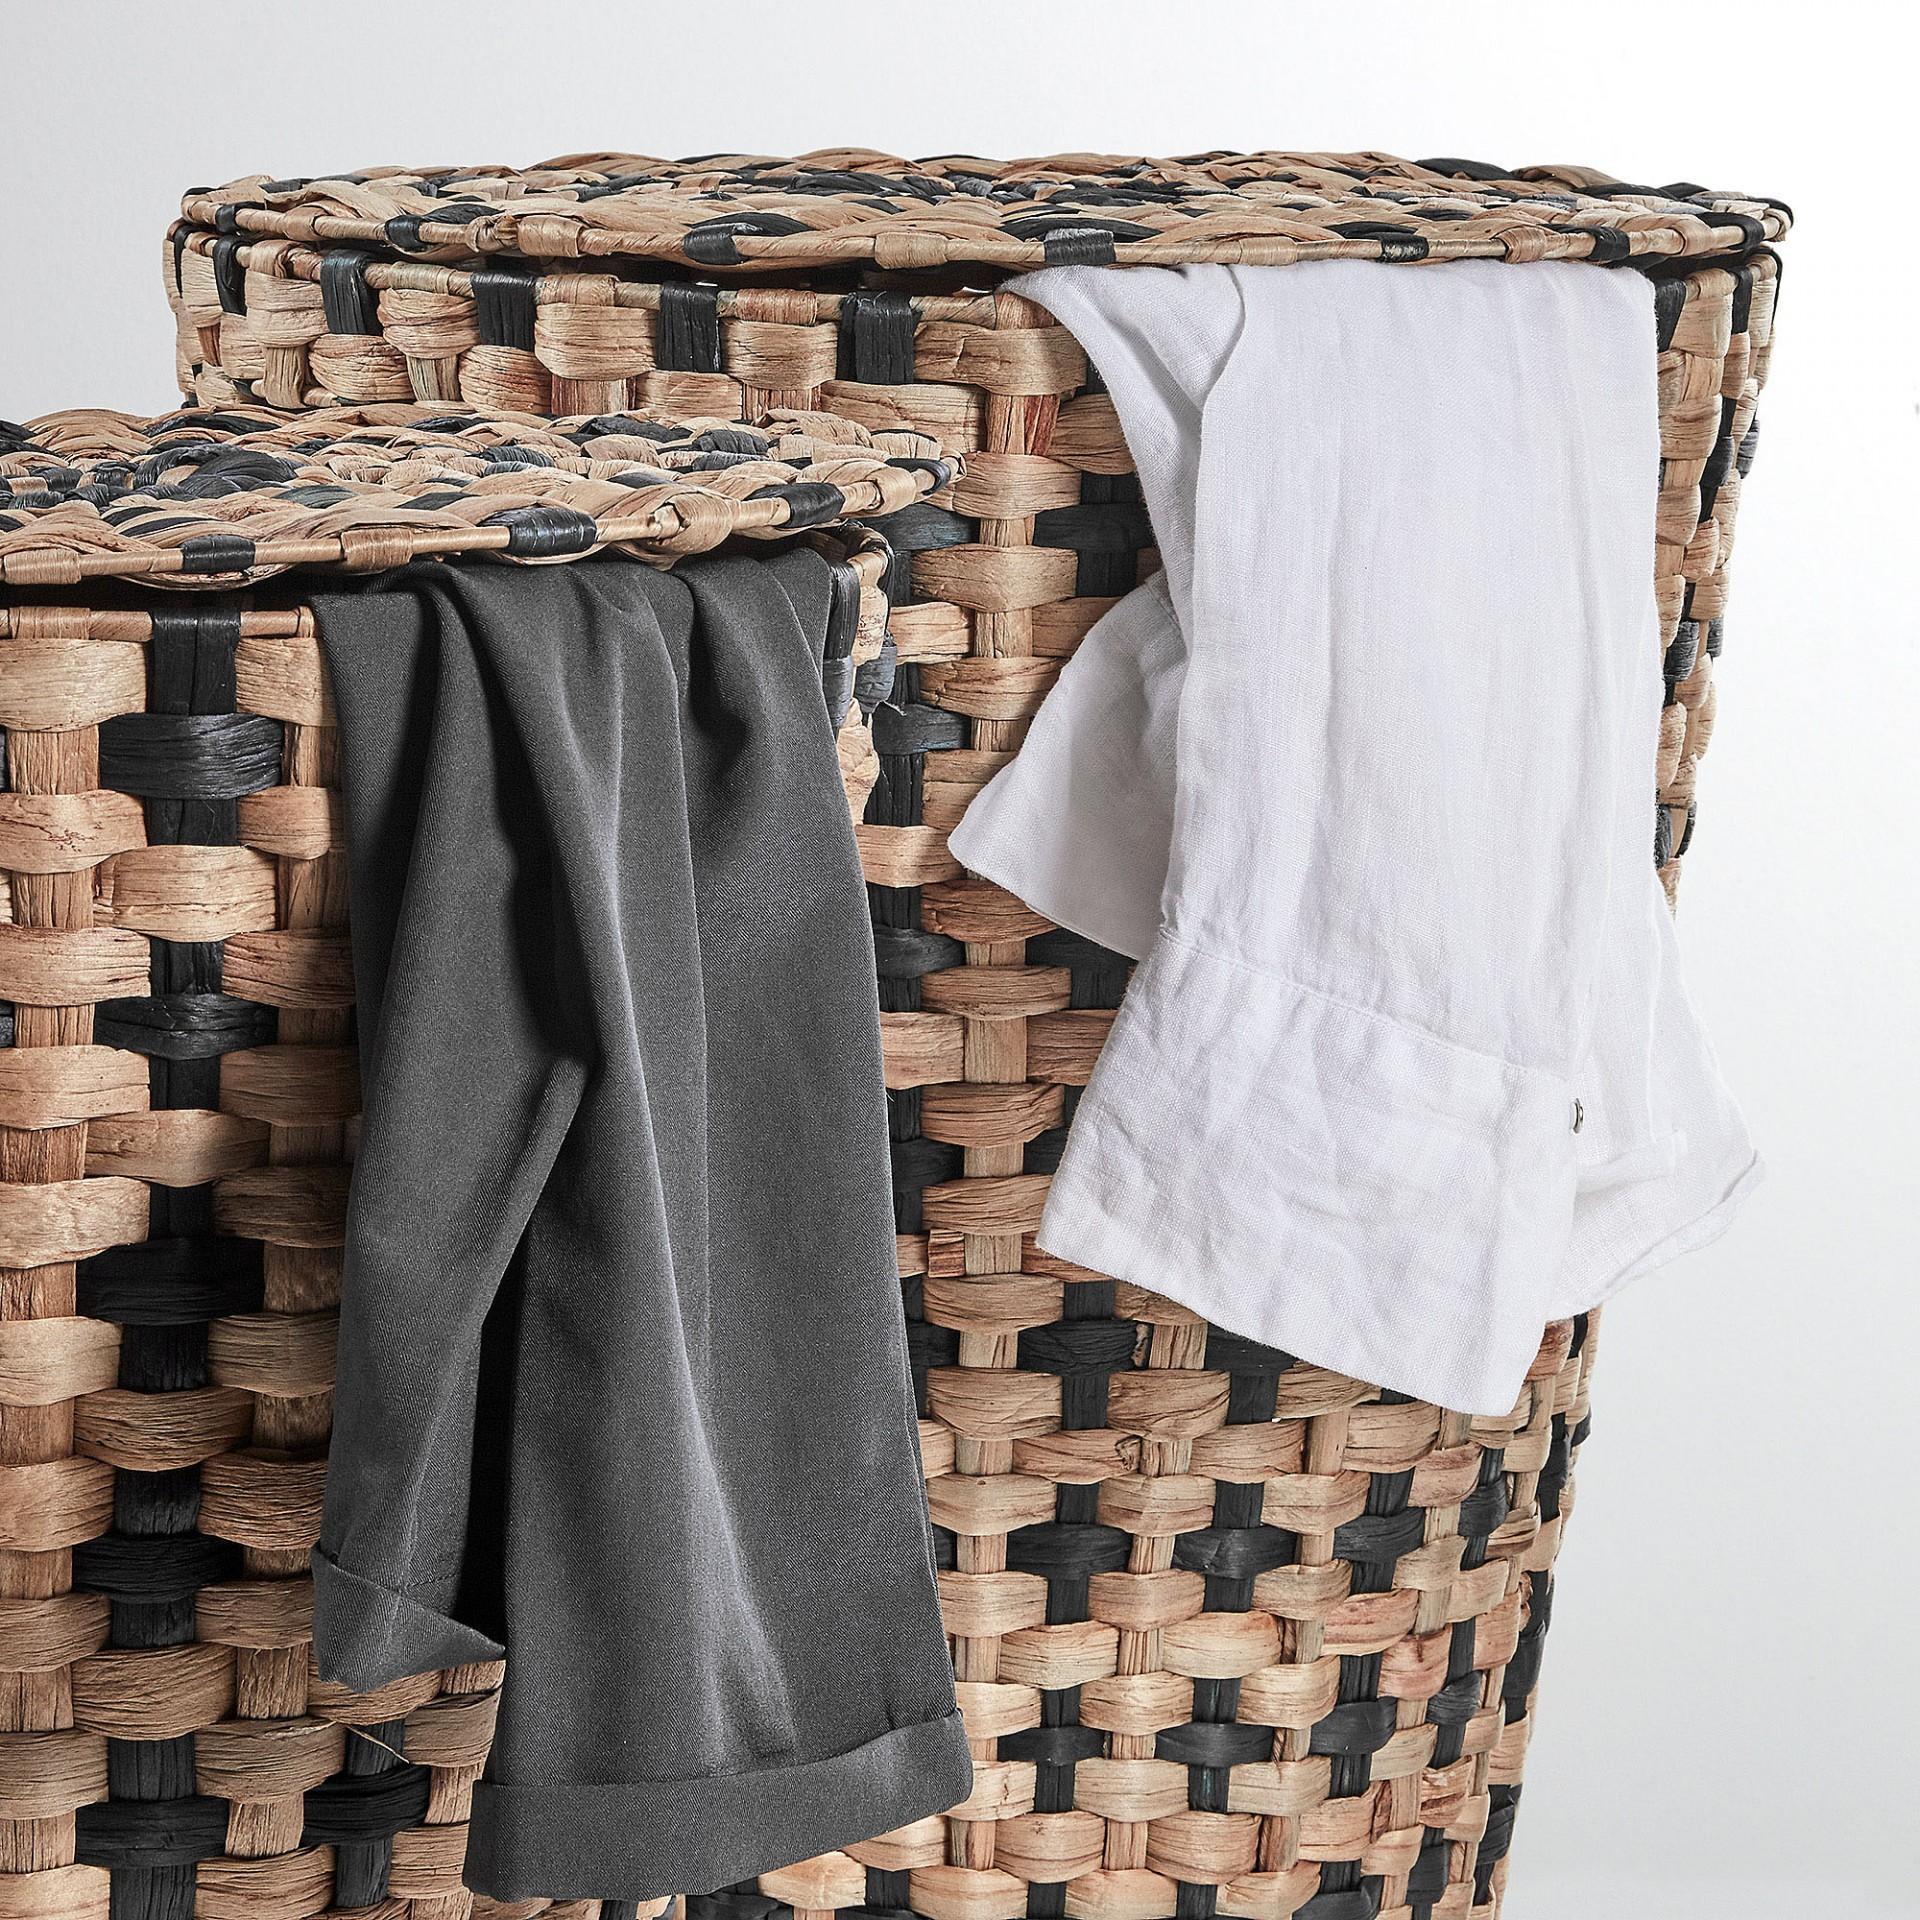 Cestos p/roupa, Jacinto-de-água, preto, (Conj.2)